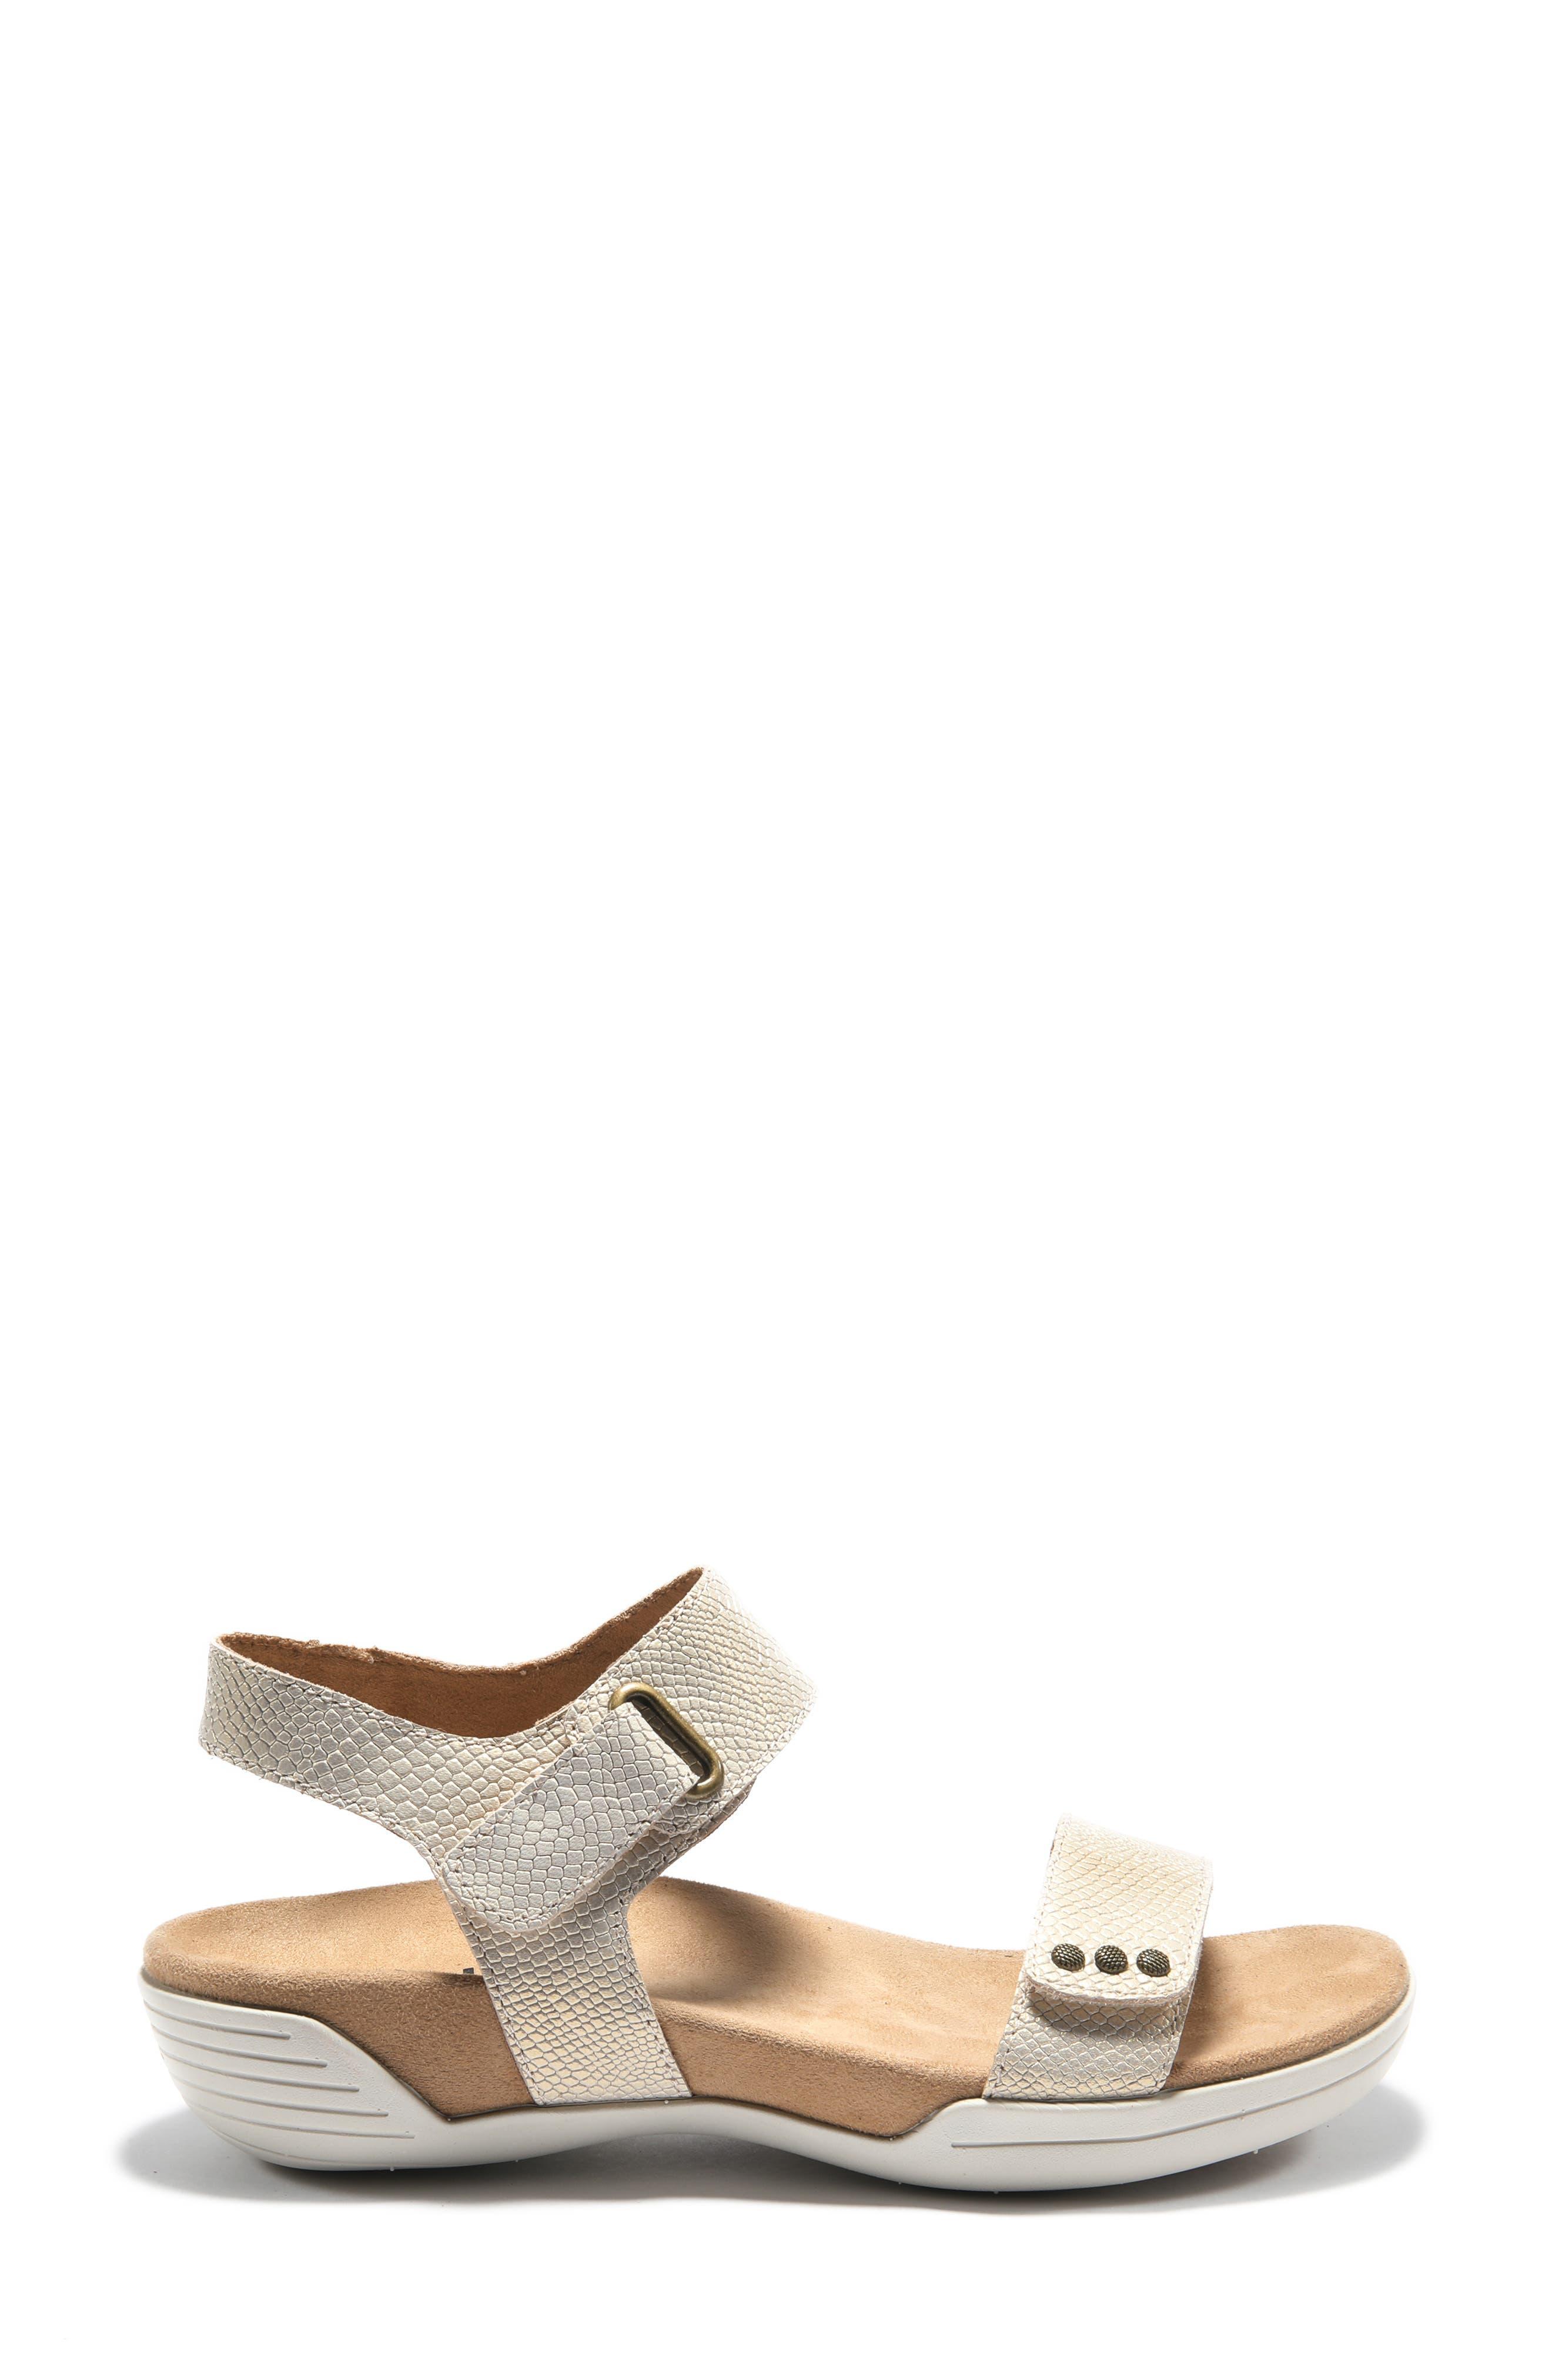 Halsa Footwear Dominica Sandal